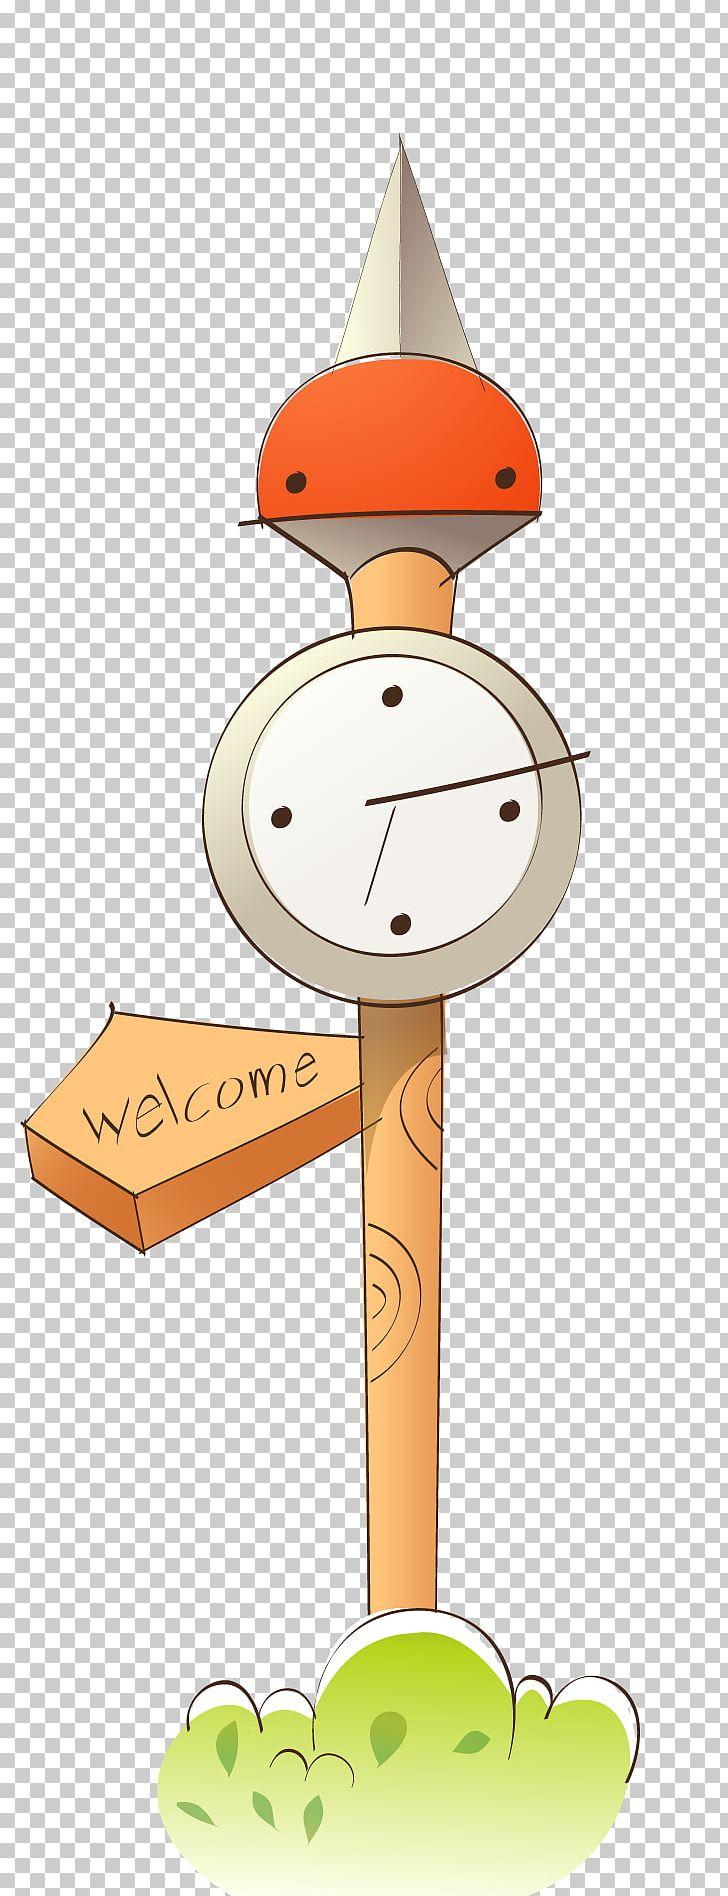 Cartoon Icon PNG, Clipart, Adobe Illustrator, Animation